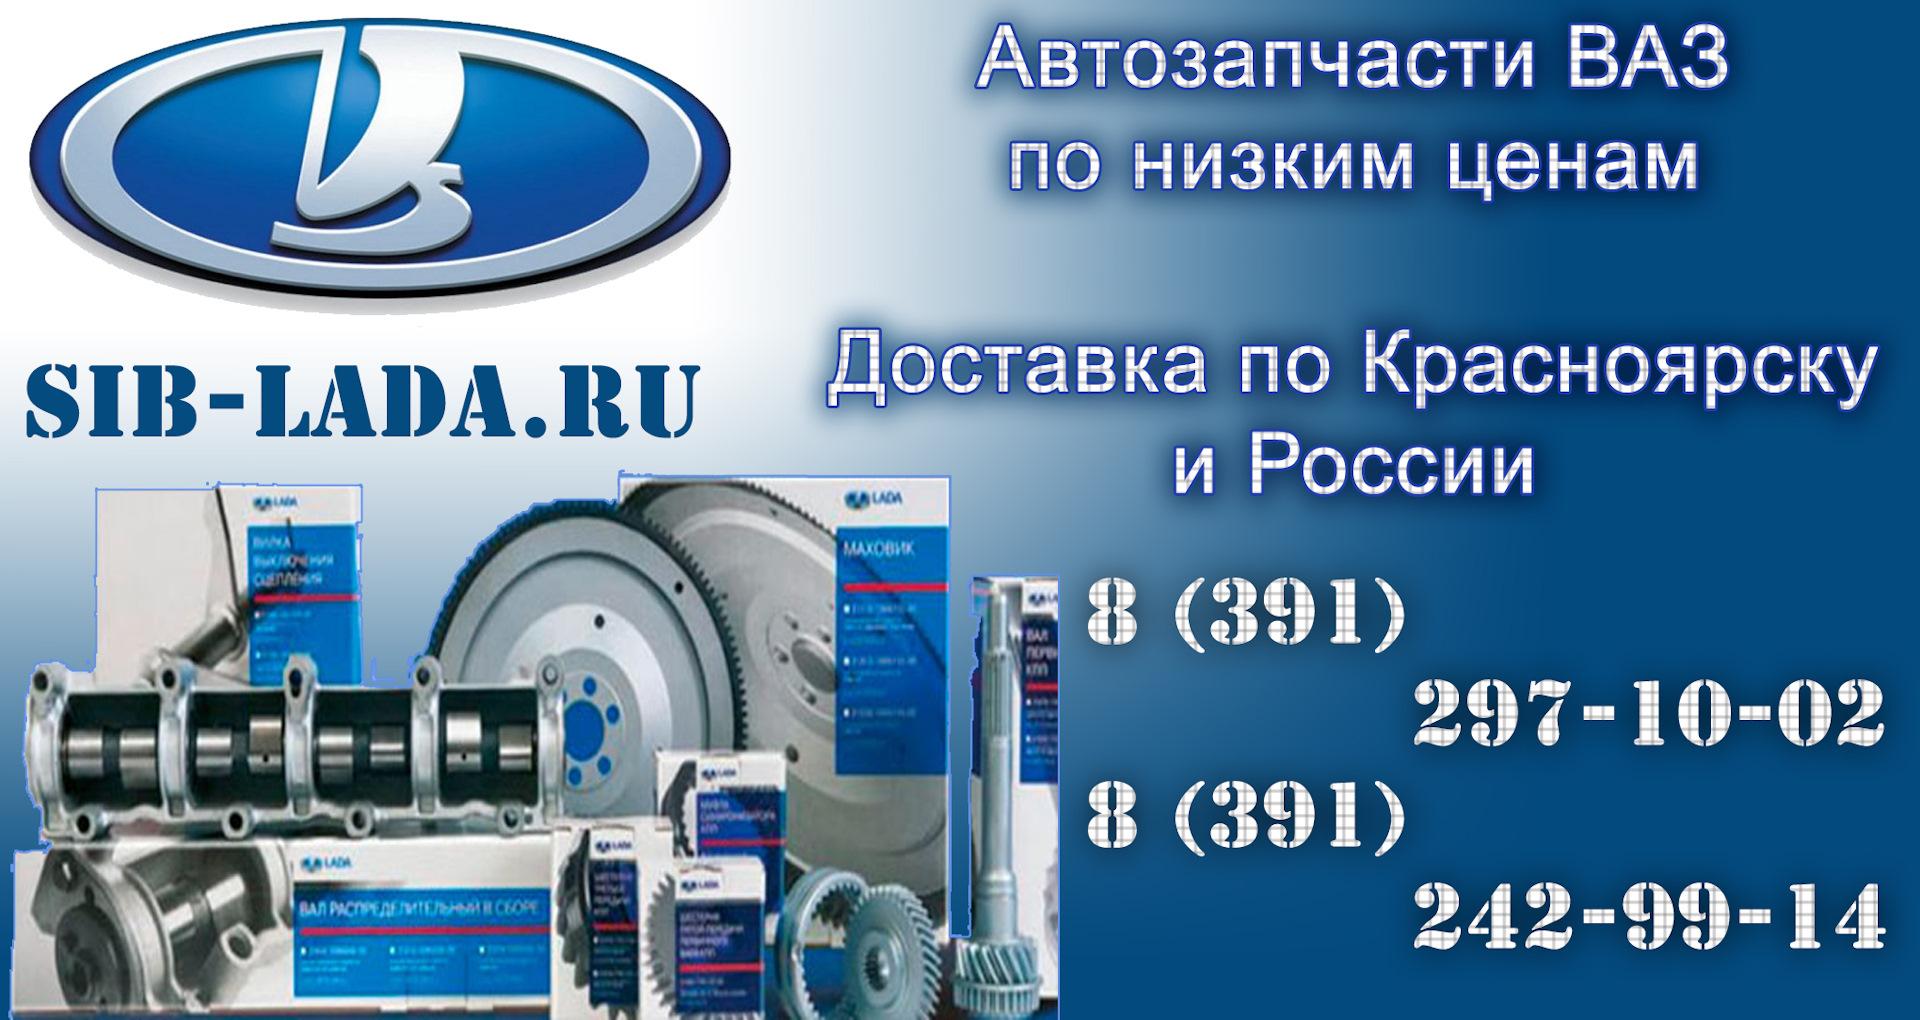 Интернет Магазин Ваз Красноярск